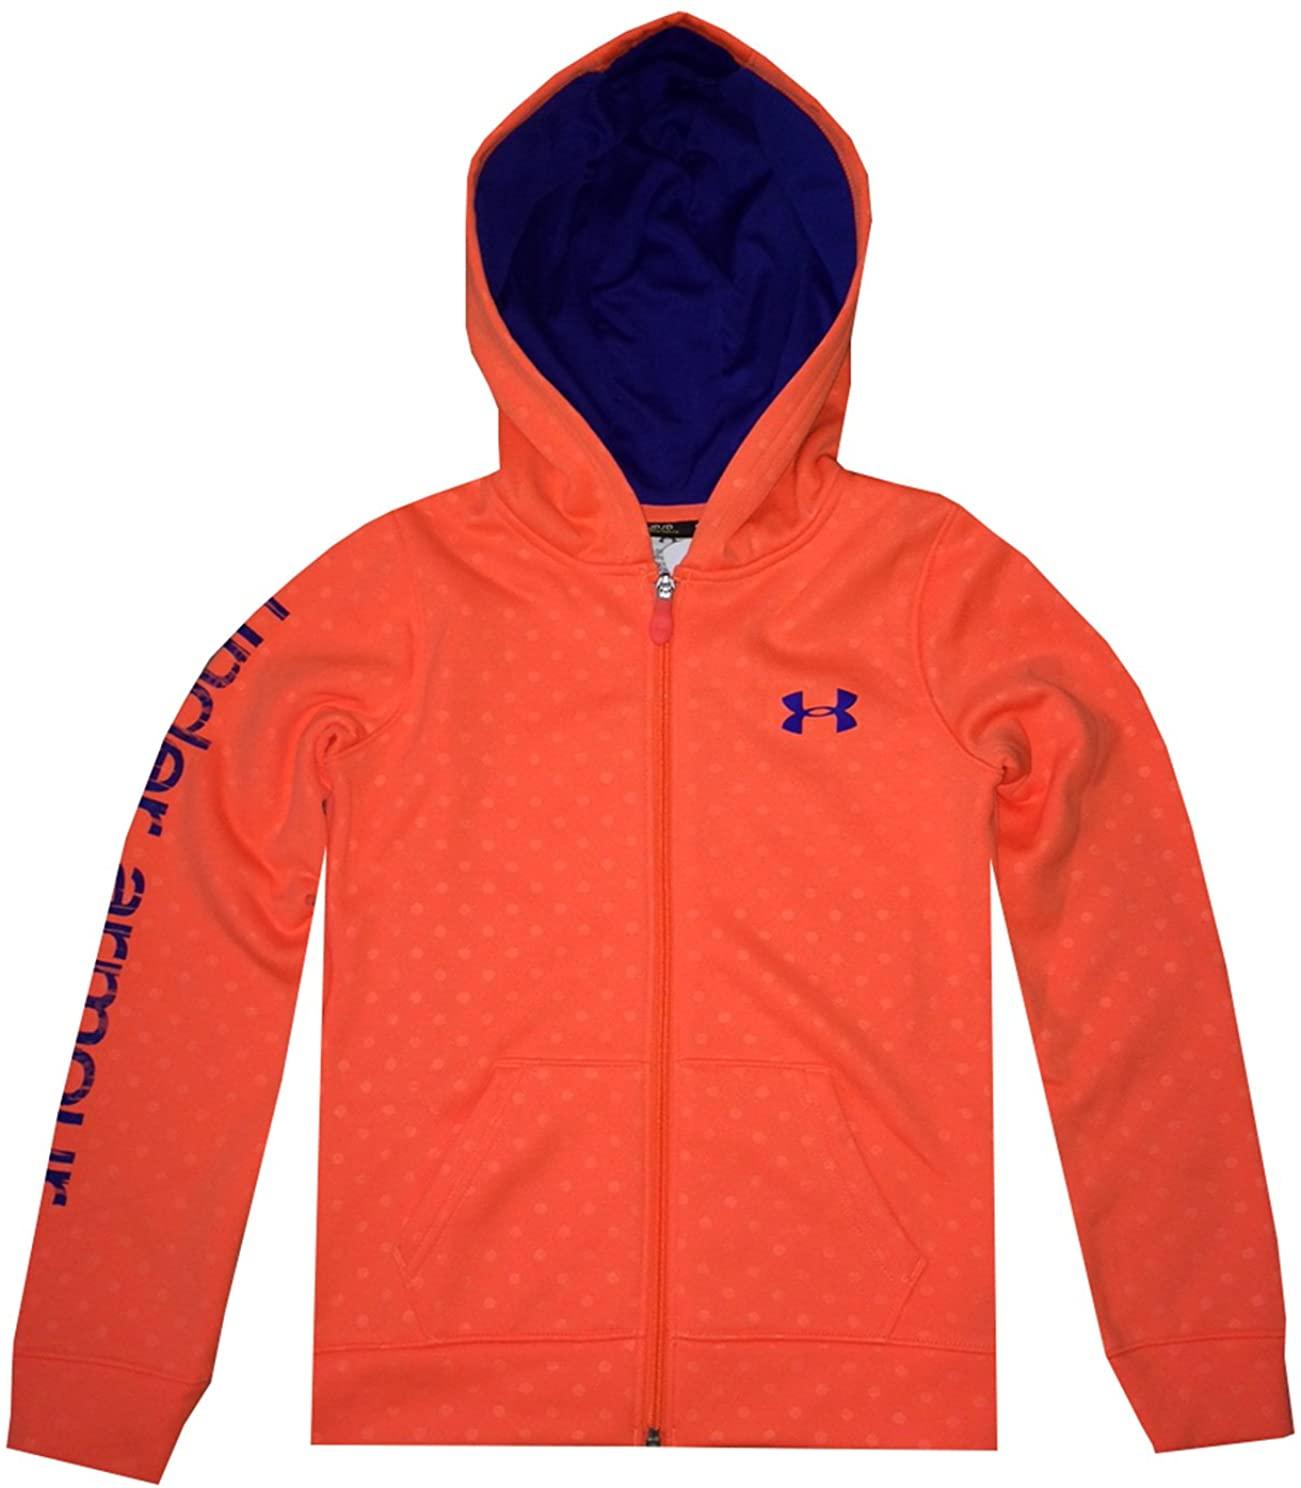 Under Armour Youth Girls Coldgear Fleece Full Zip Hoodie Jacket